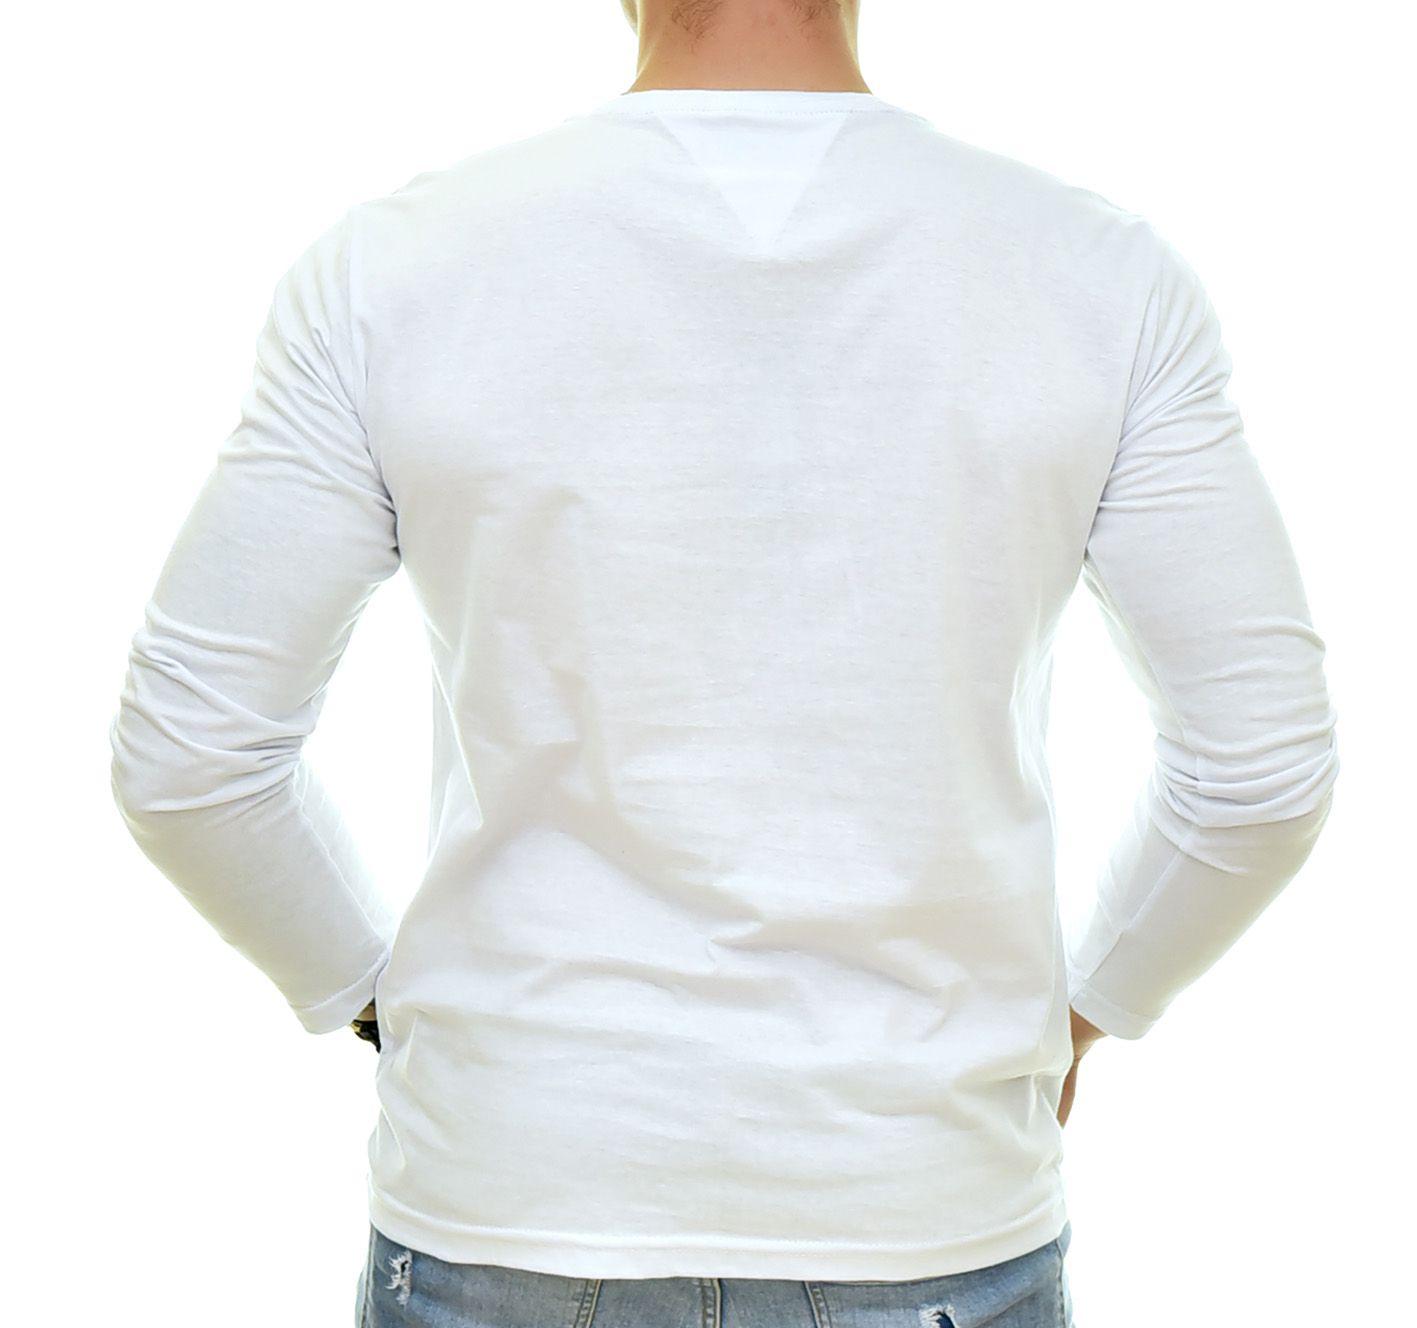 Camiseta TH Manga Longa Branca 06  - Ca Brasileira